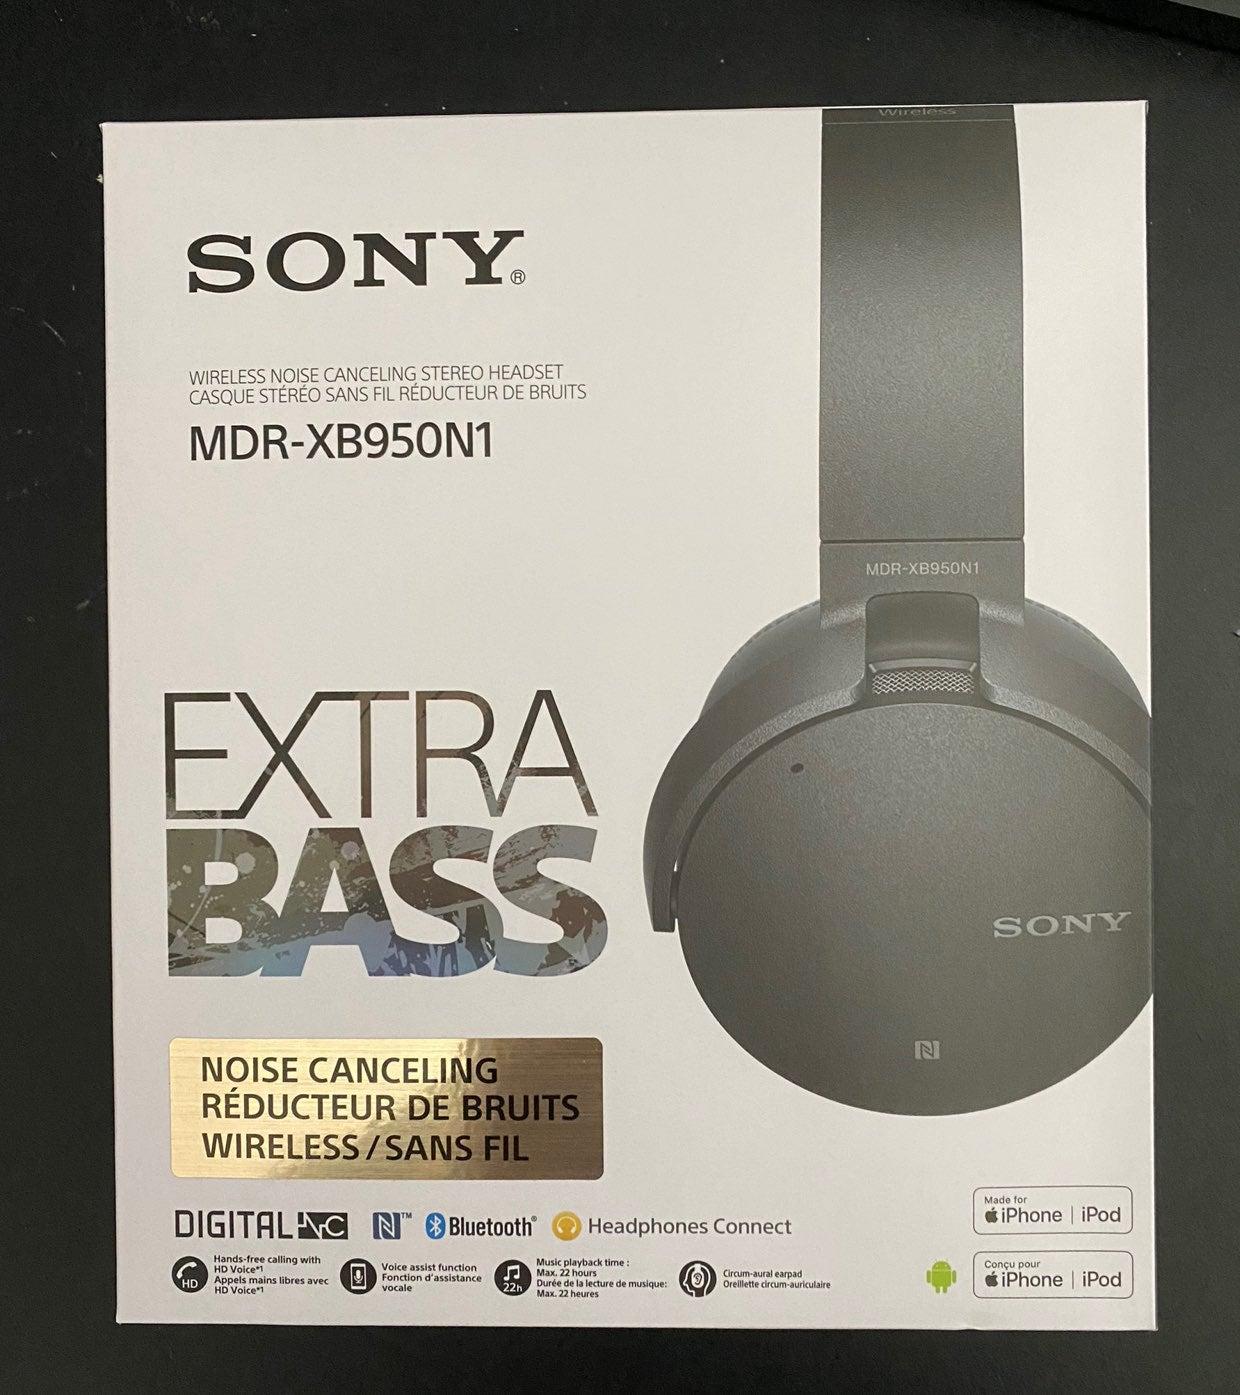 Sony Headset xb950n1